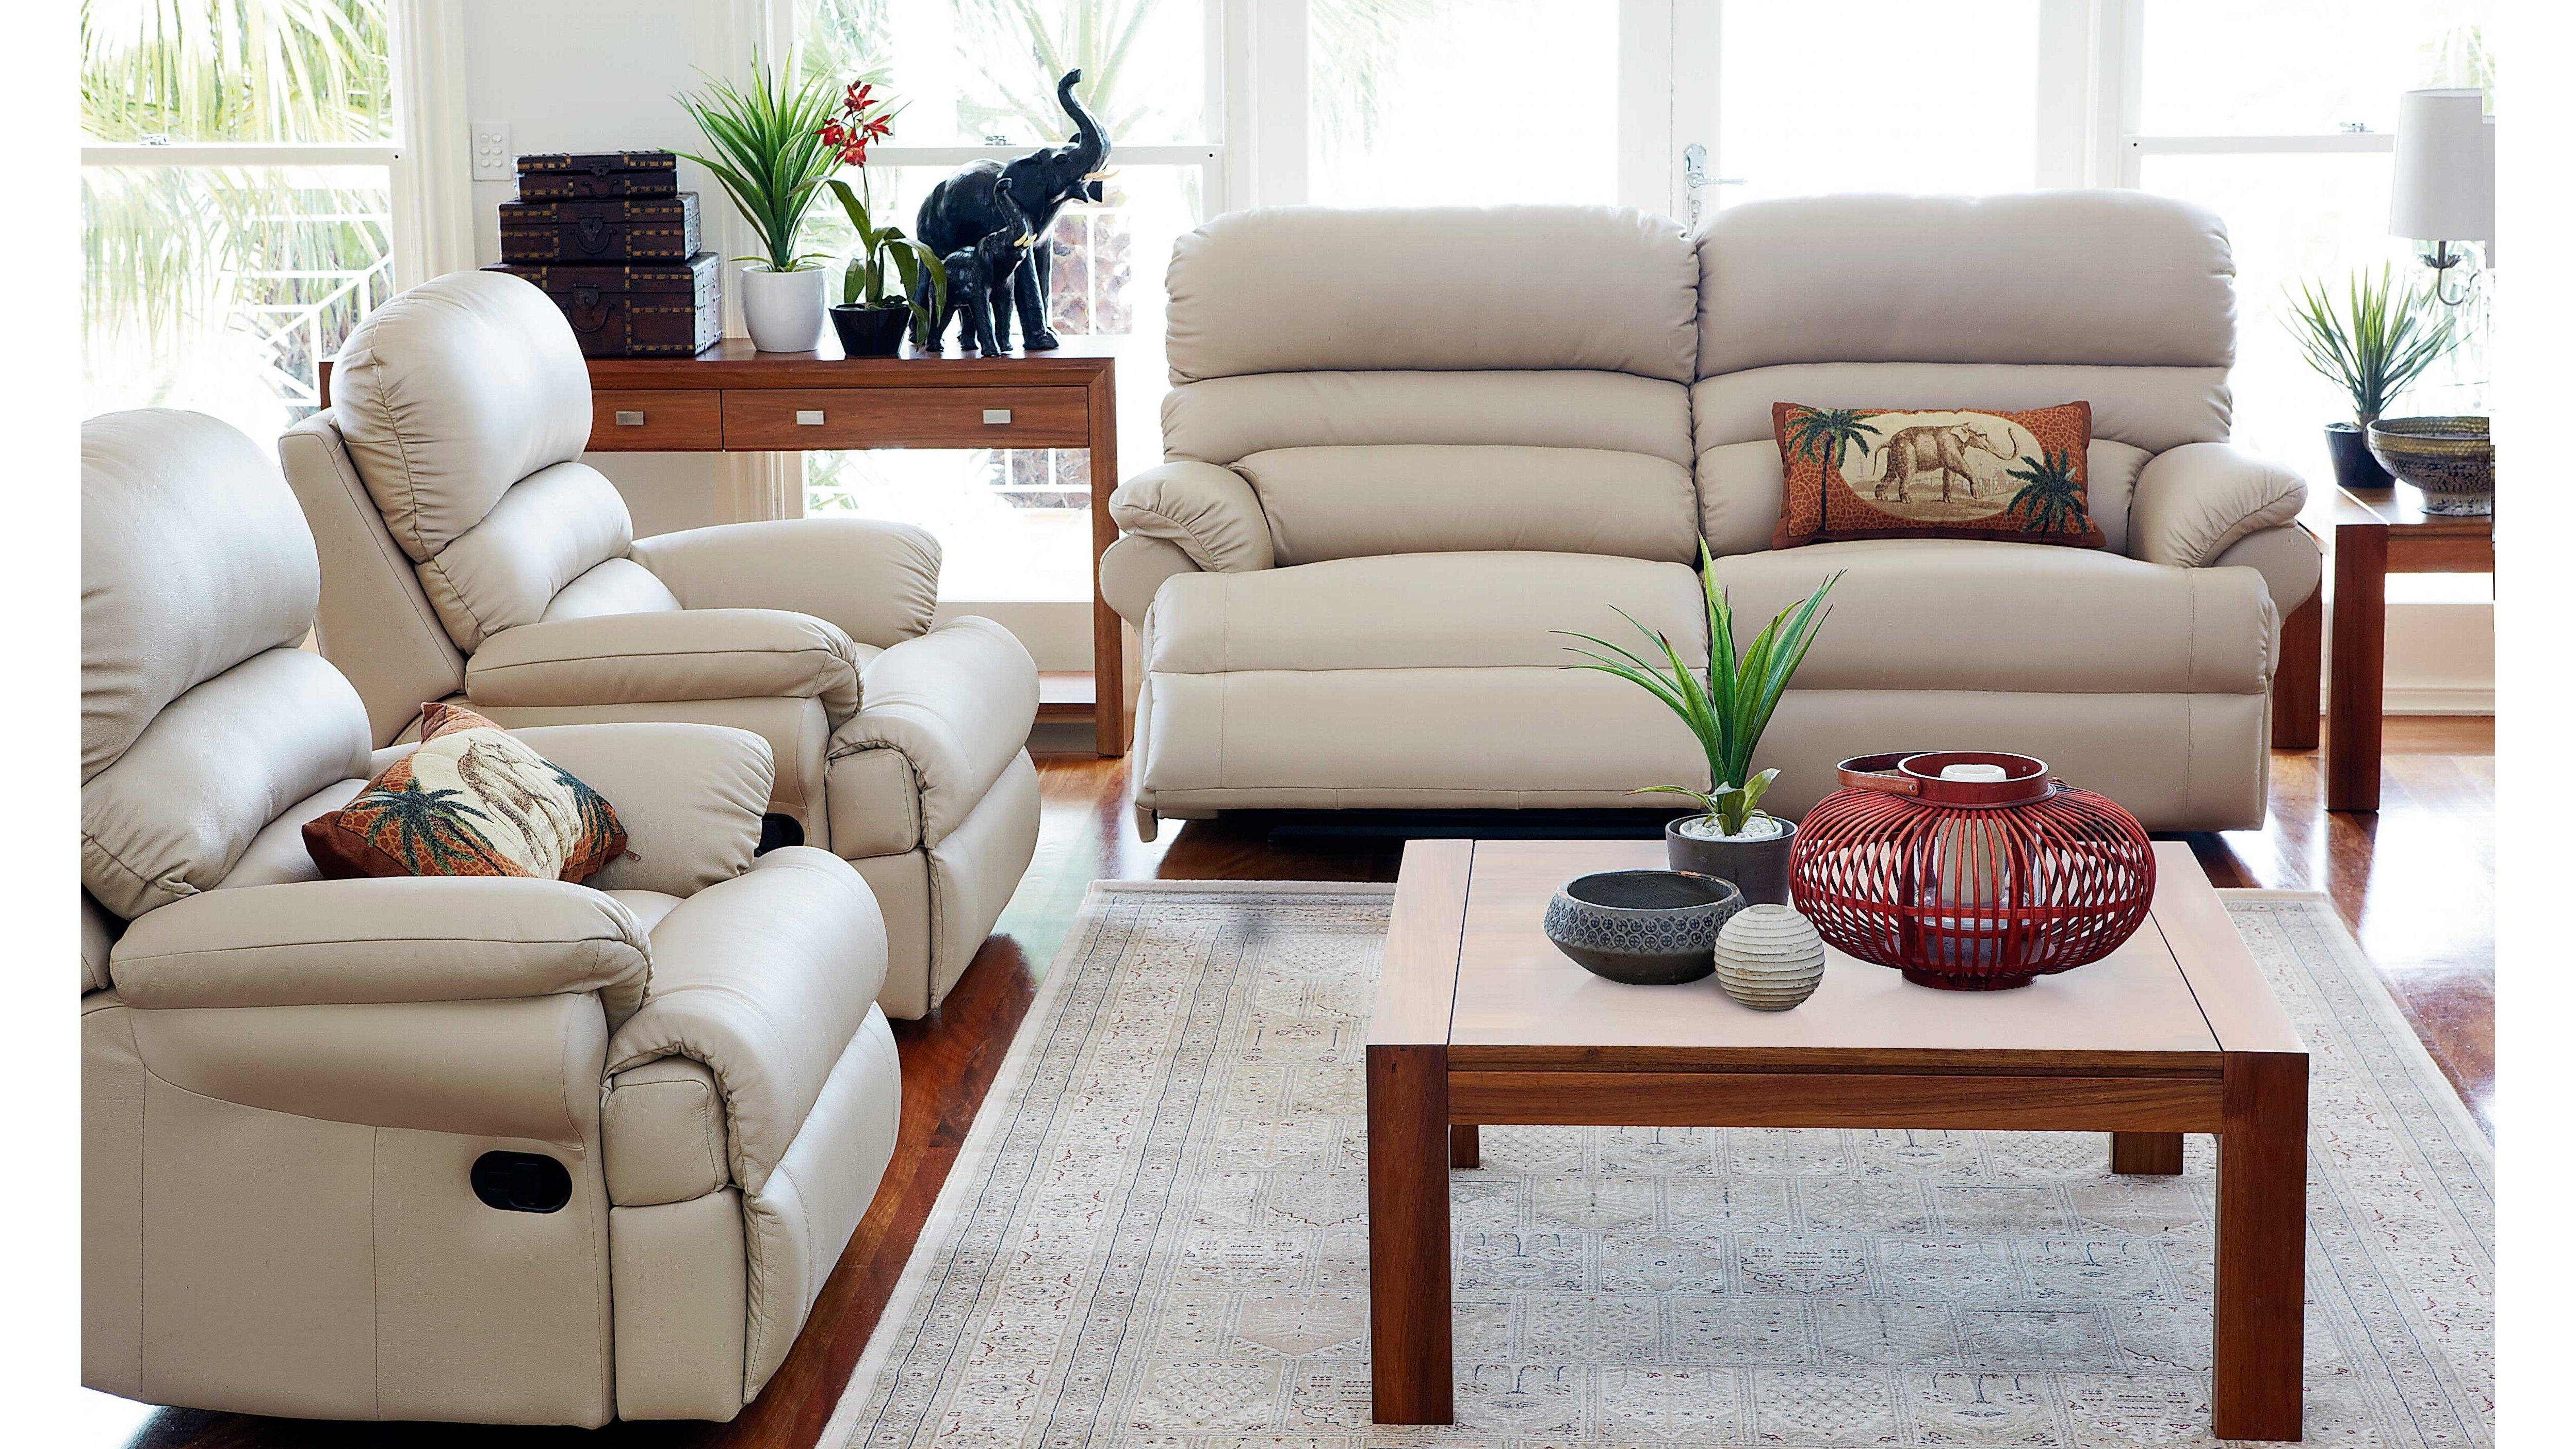 Benson 3 Piece Recliner Lounge Suite Home